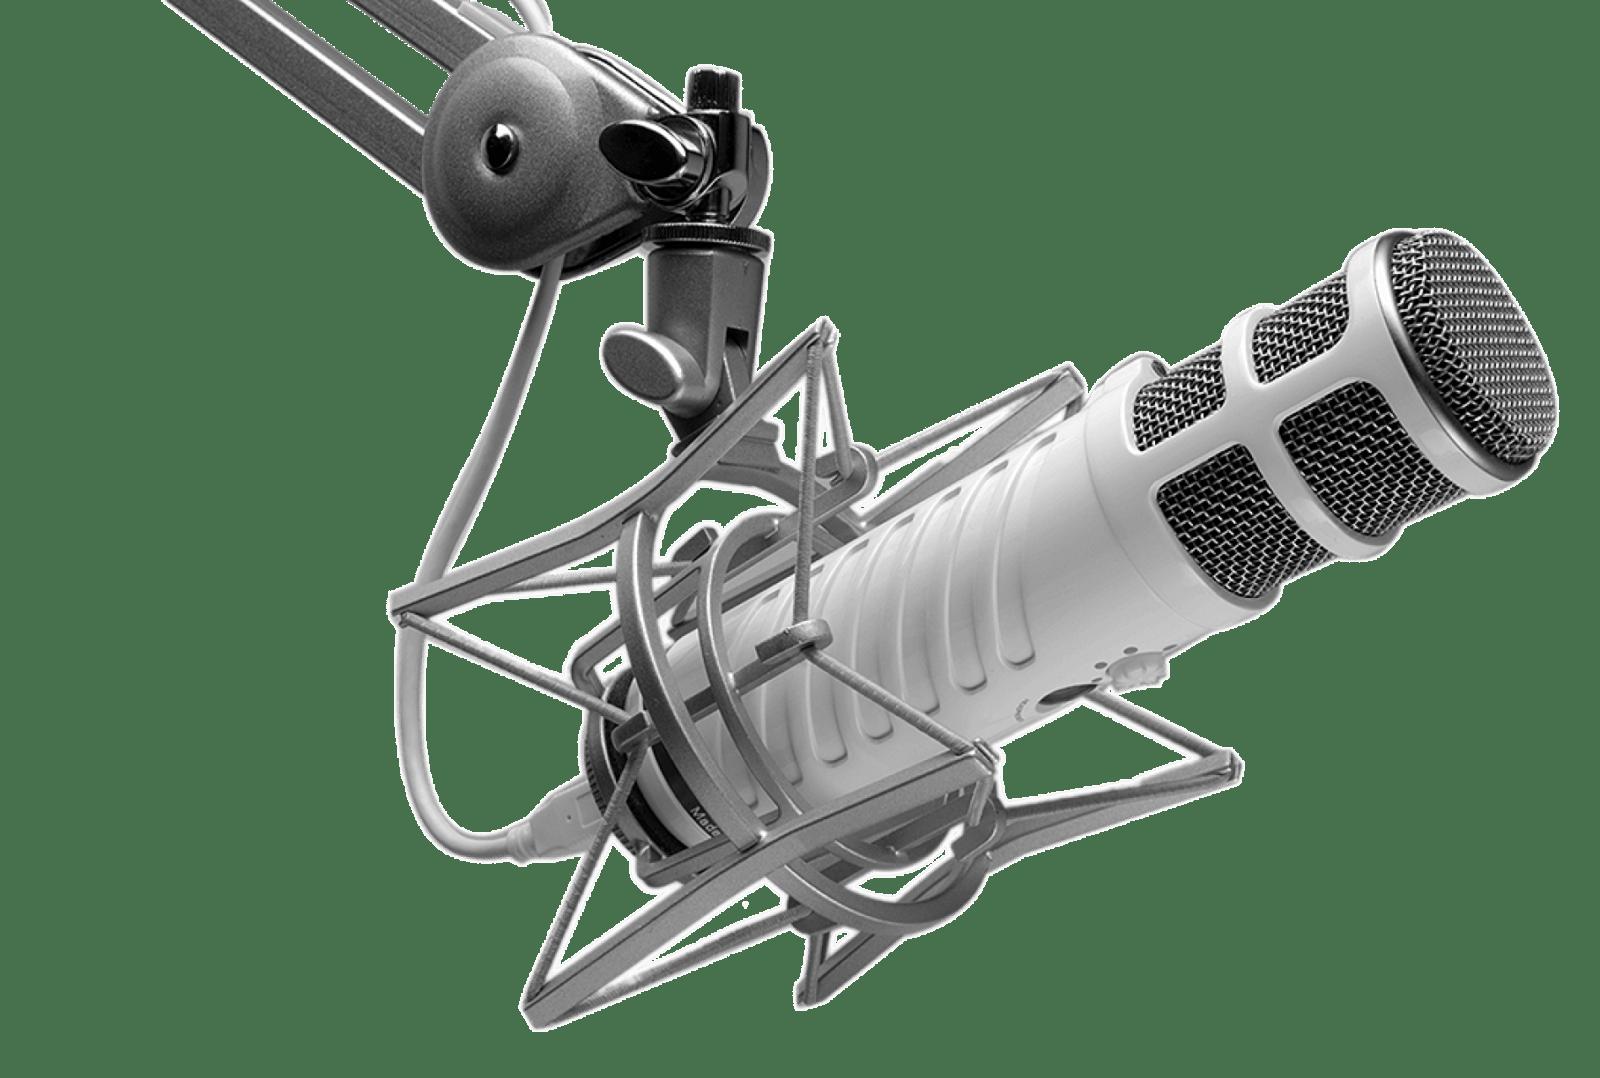 Micro Radio Voix Off Clément